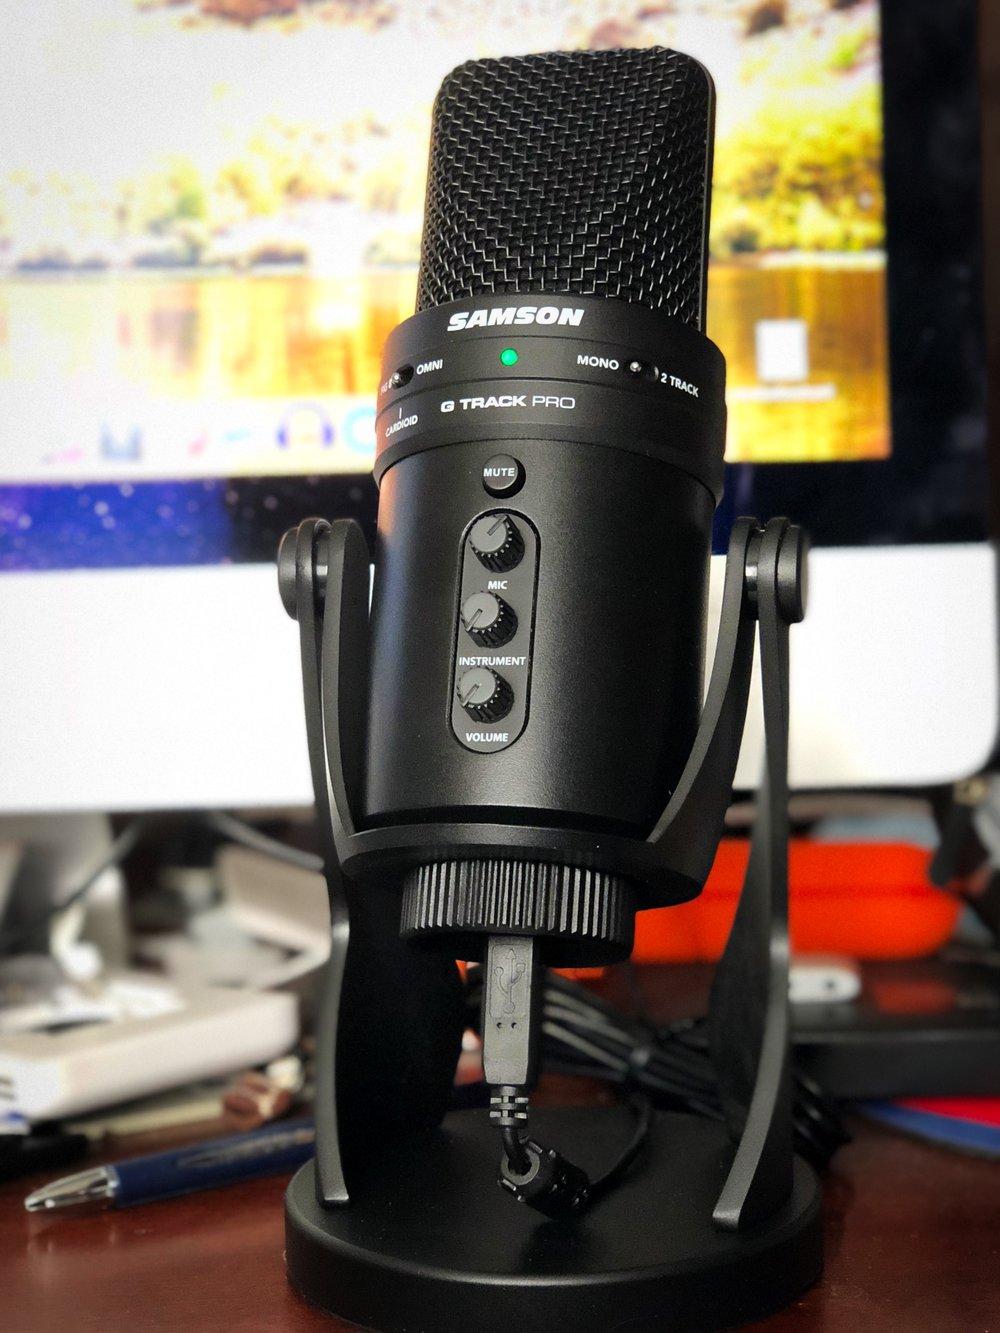 Samson G Track Pro USB Studio Microphone. Image © 2017, Steven Sande